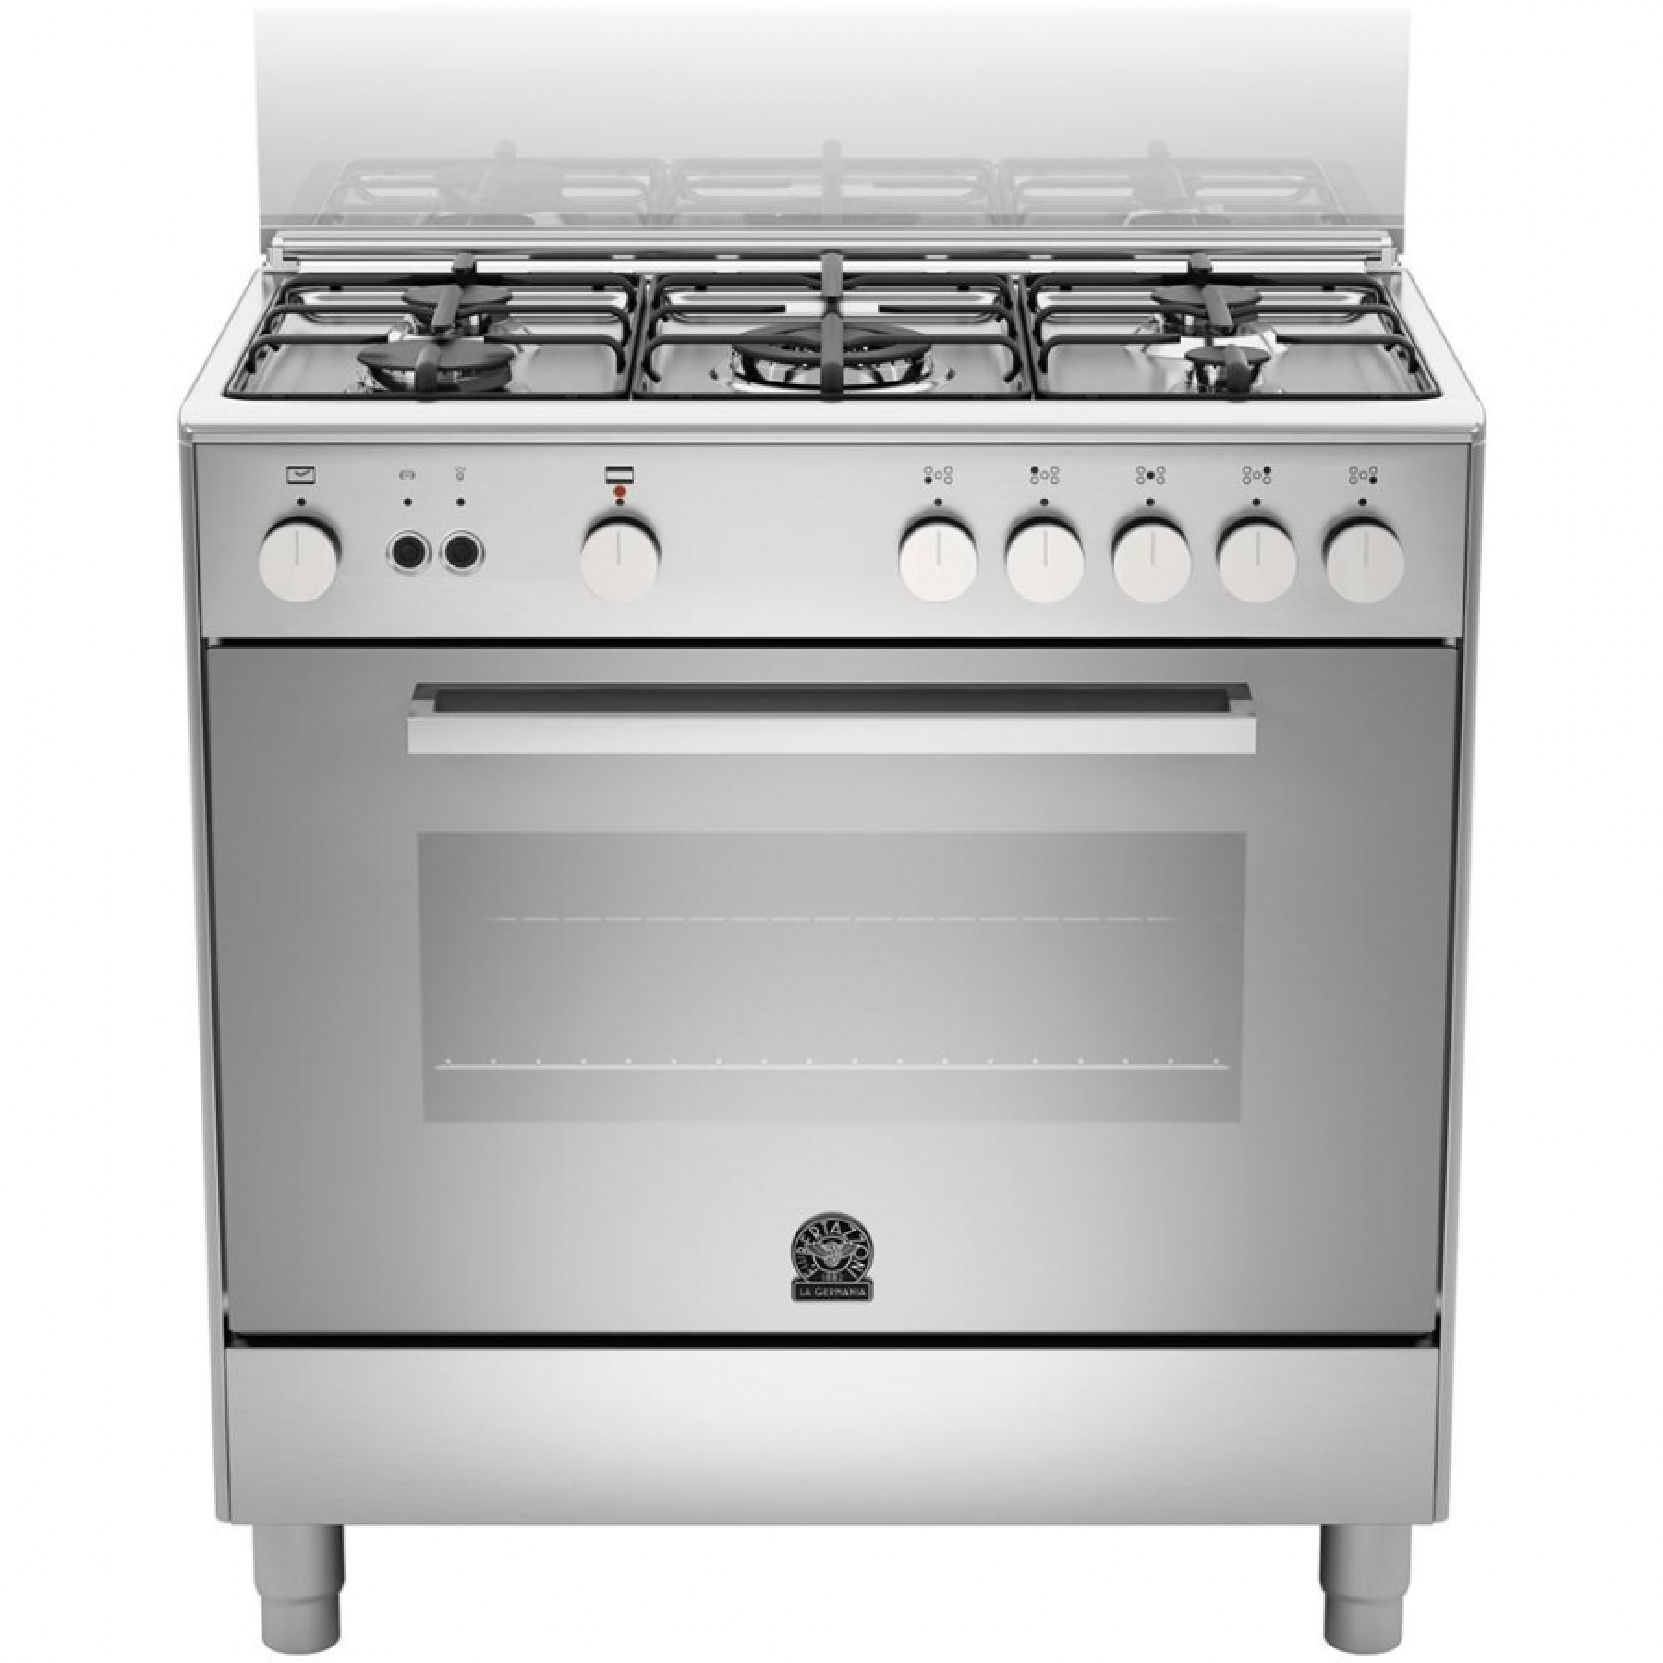 Stunning Cucine Gas Prezzi Contemporary - Home Ideas - tyger.us